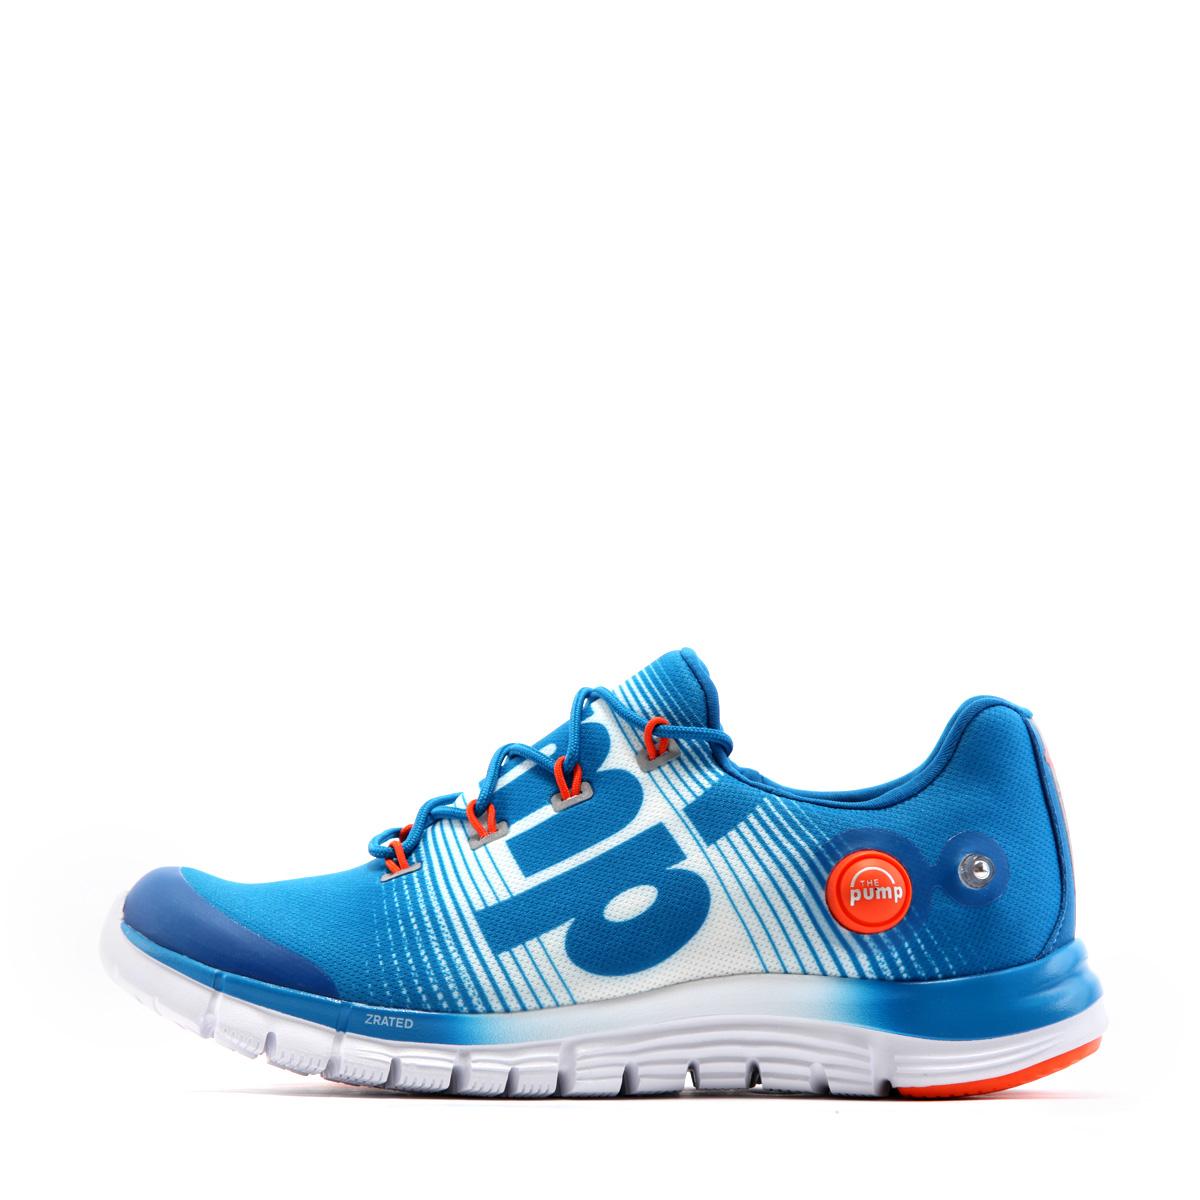 REEBOK ZPUMP FUSION M49953 跑步鞋